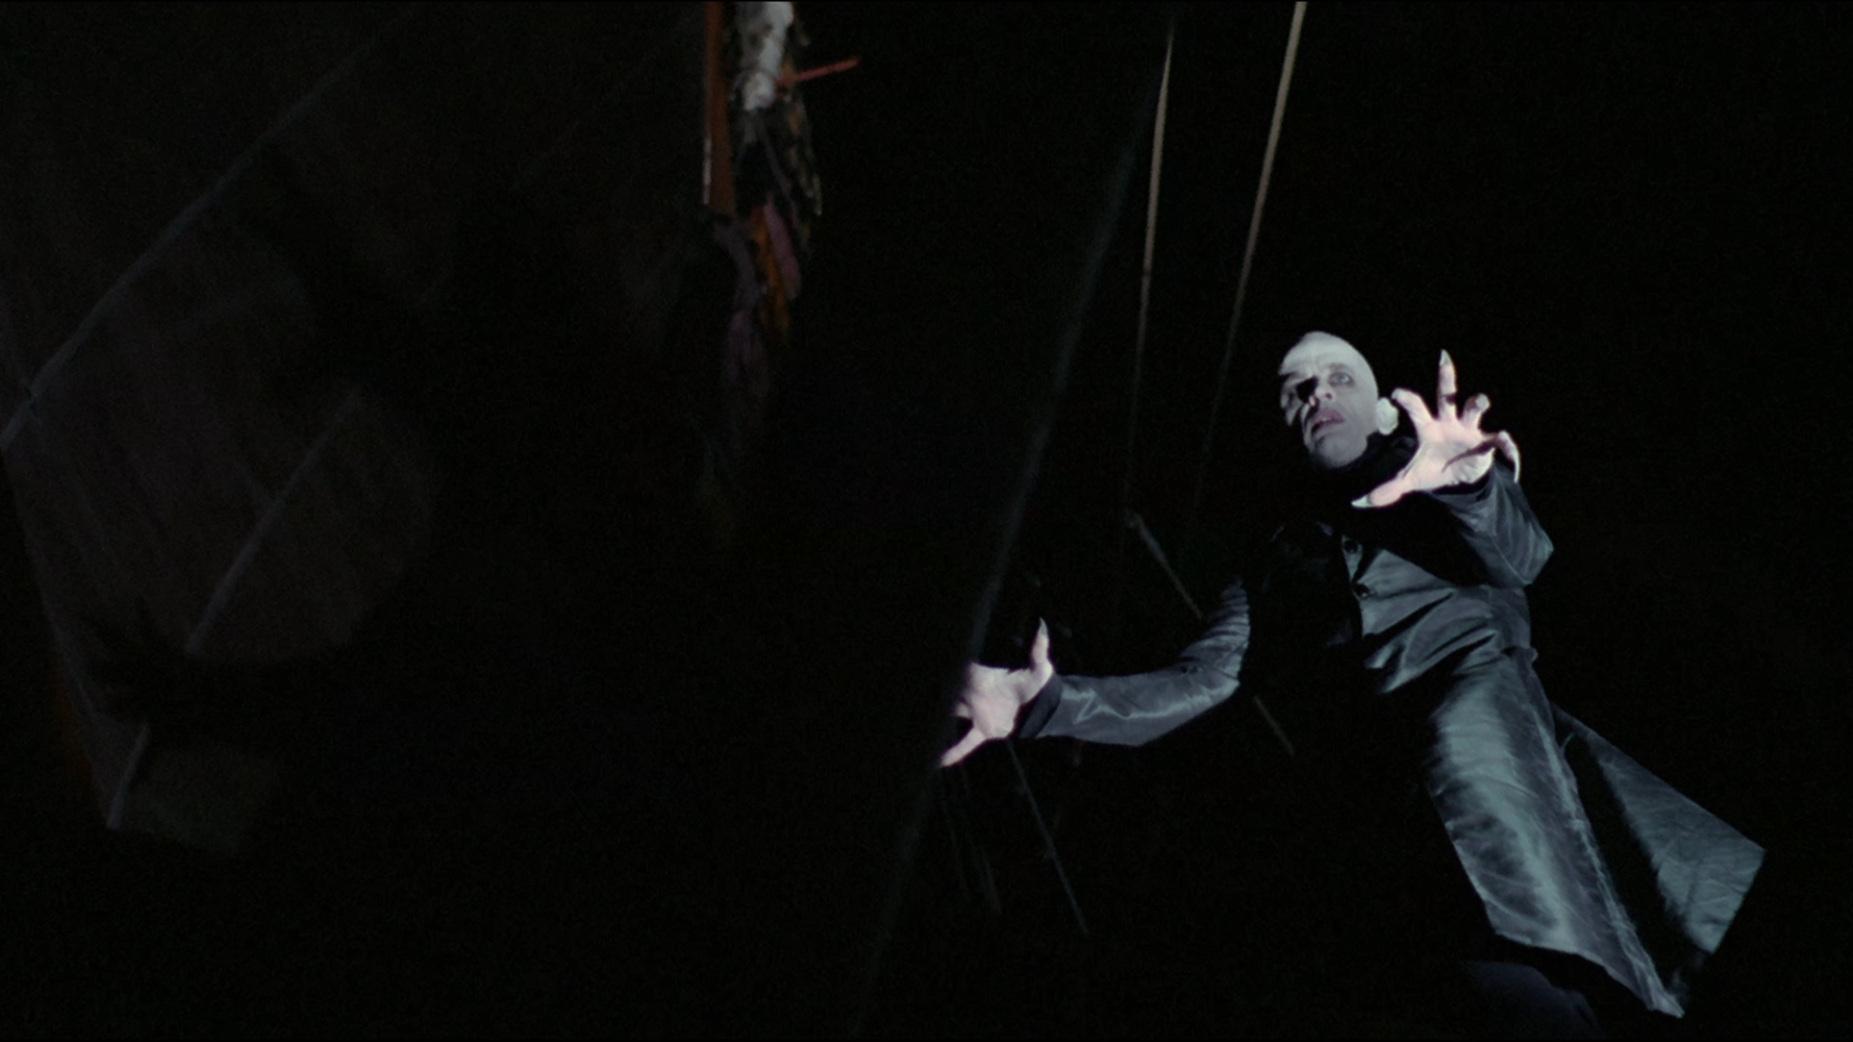 Nosferatu: Phantom der Nacht (7.11.19)